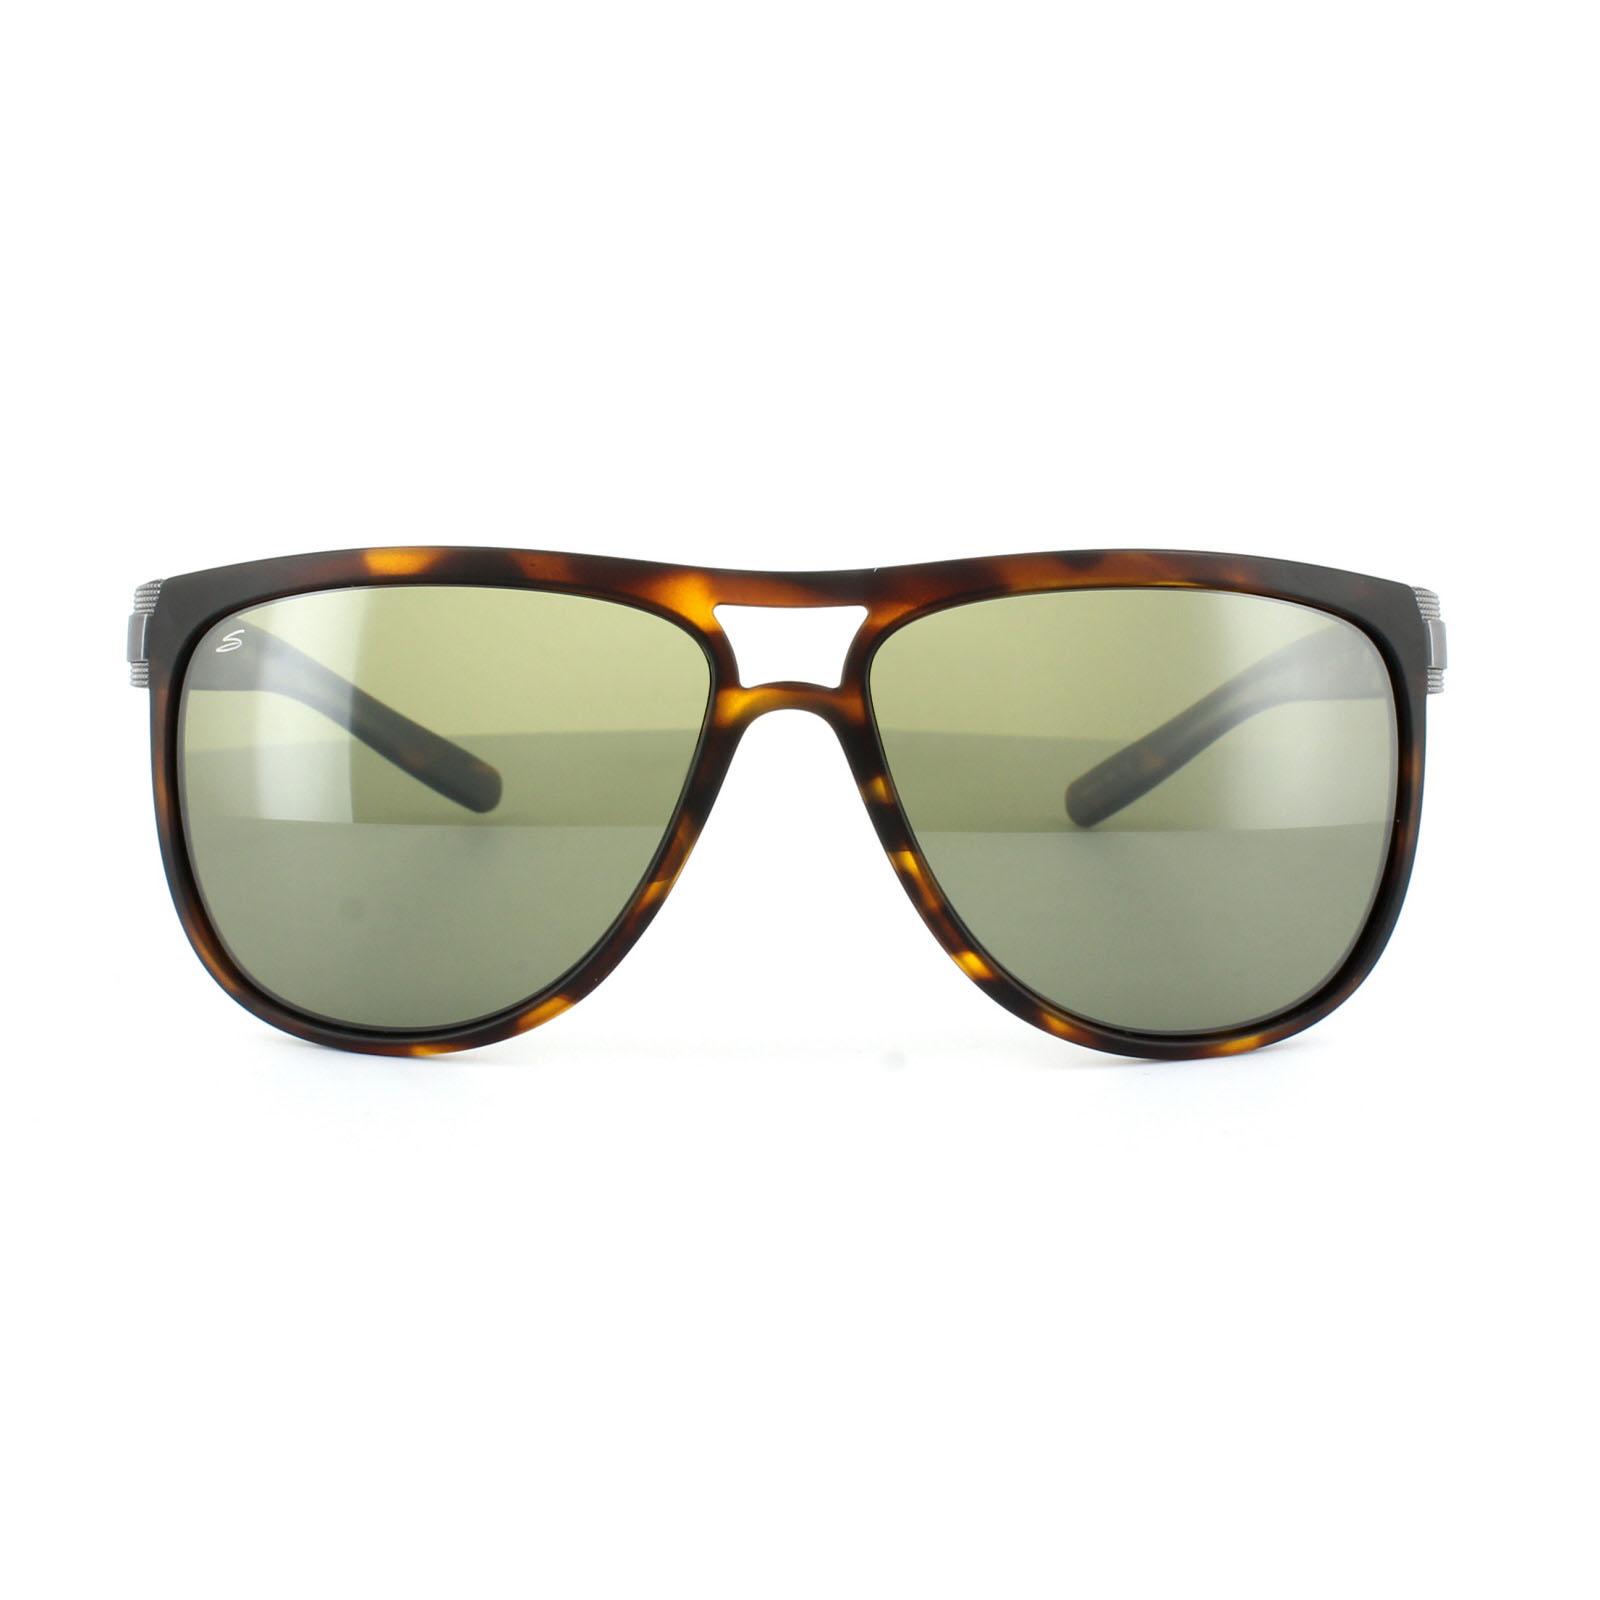 b97b71acef0b Sentinel Thumbnail 2. Sentinel Serengeti Sunglasses Verdi 7936 Satin Tortoise  Green 555nm Polarized